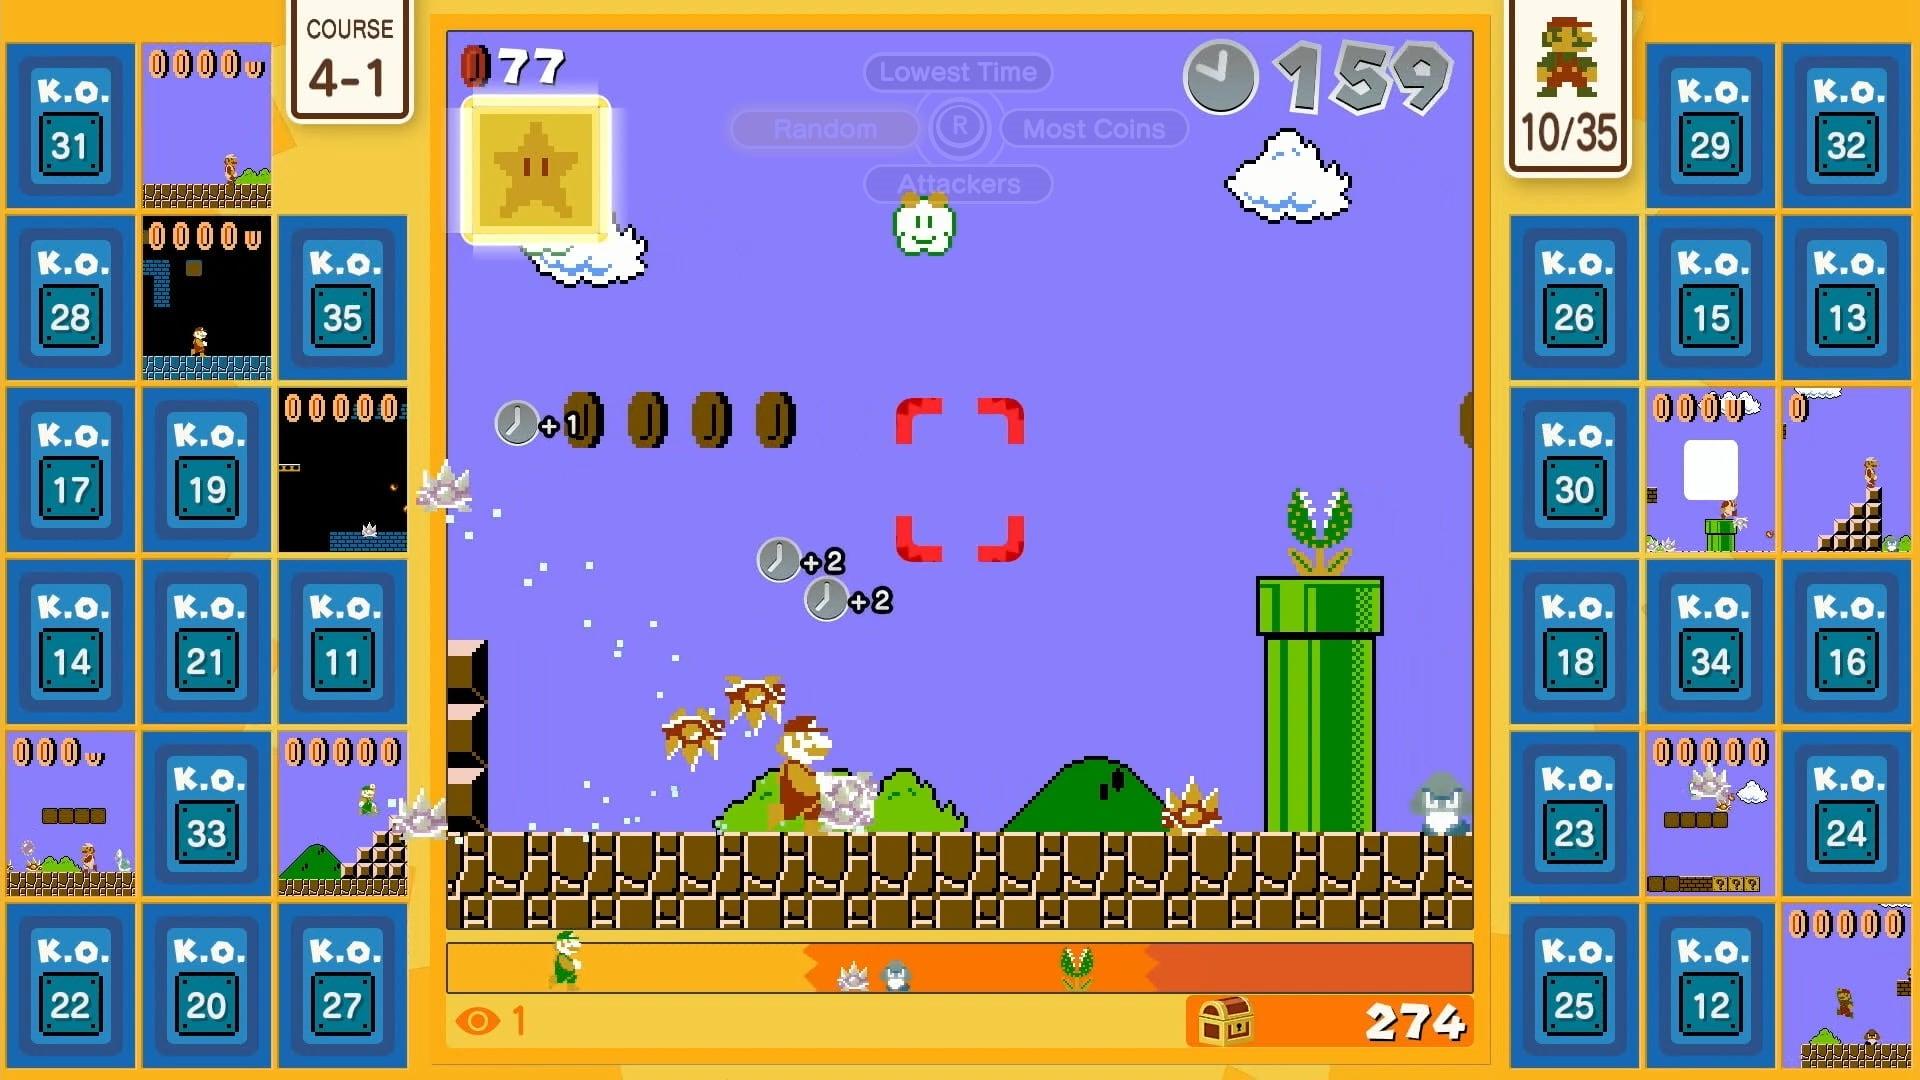 Mario 35 release time